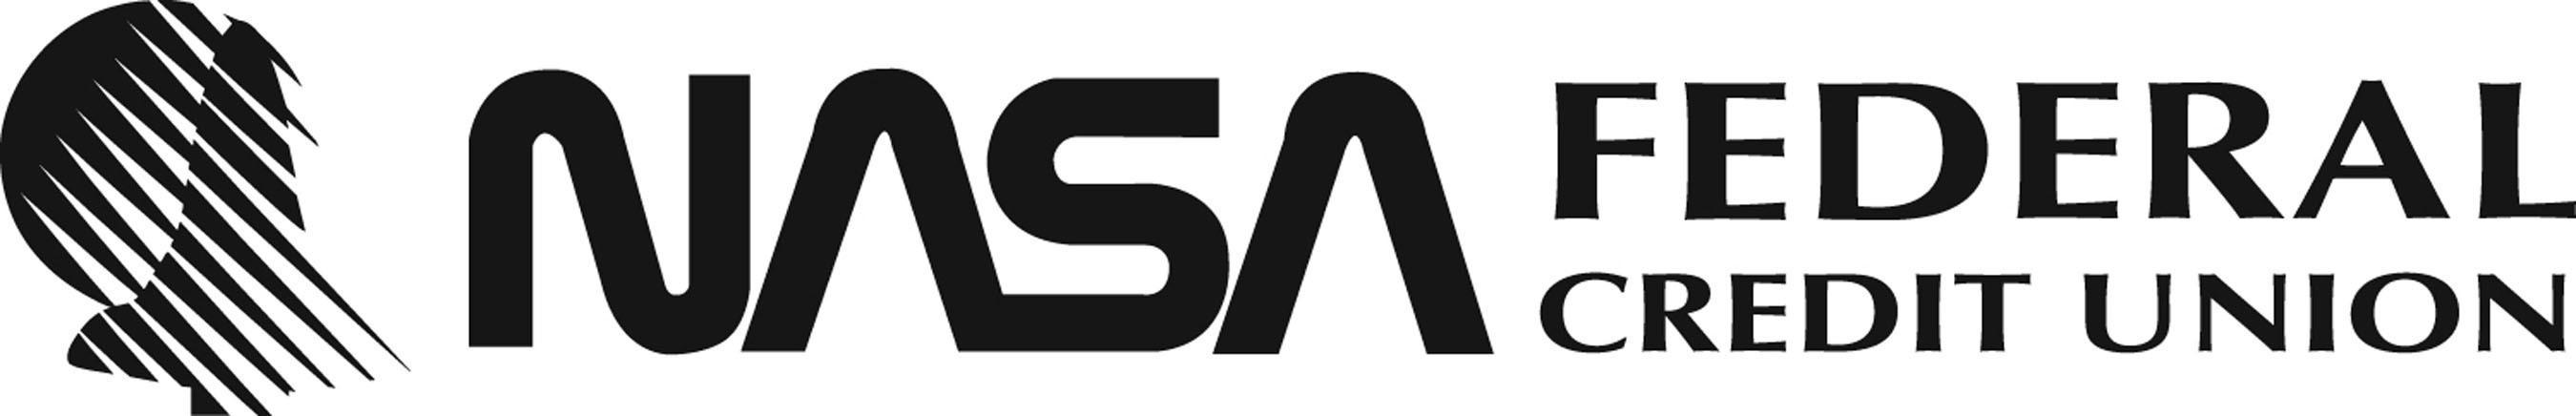 NASA Federal Credit Union logo.